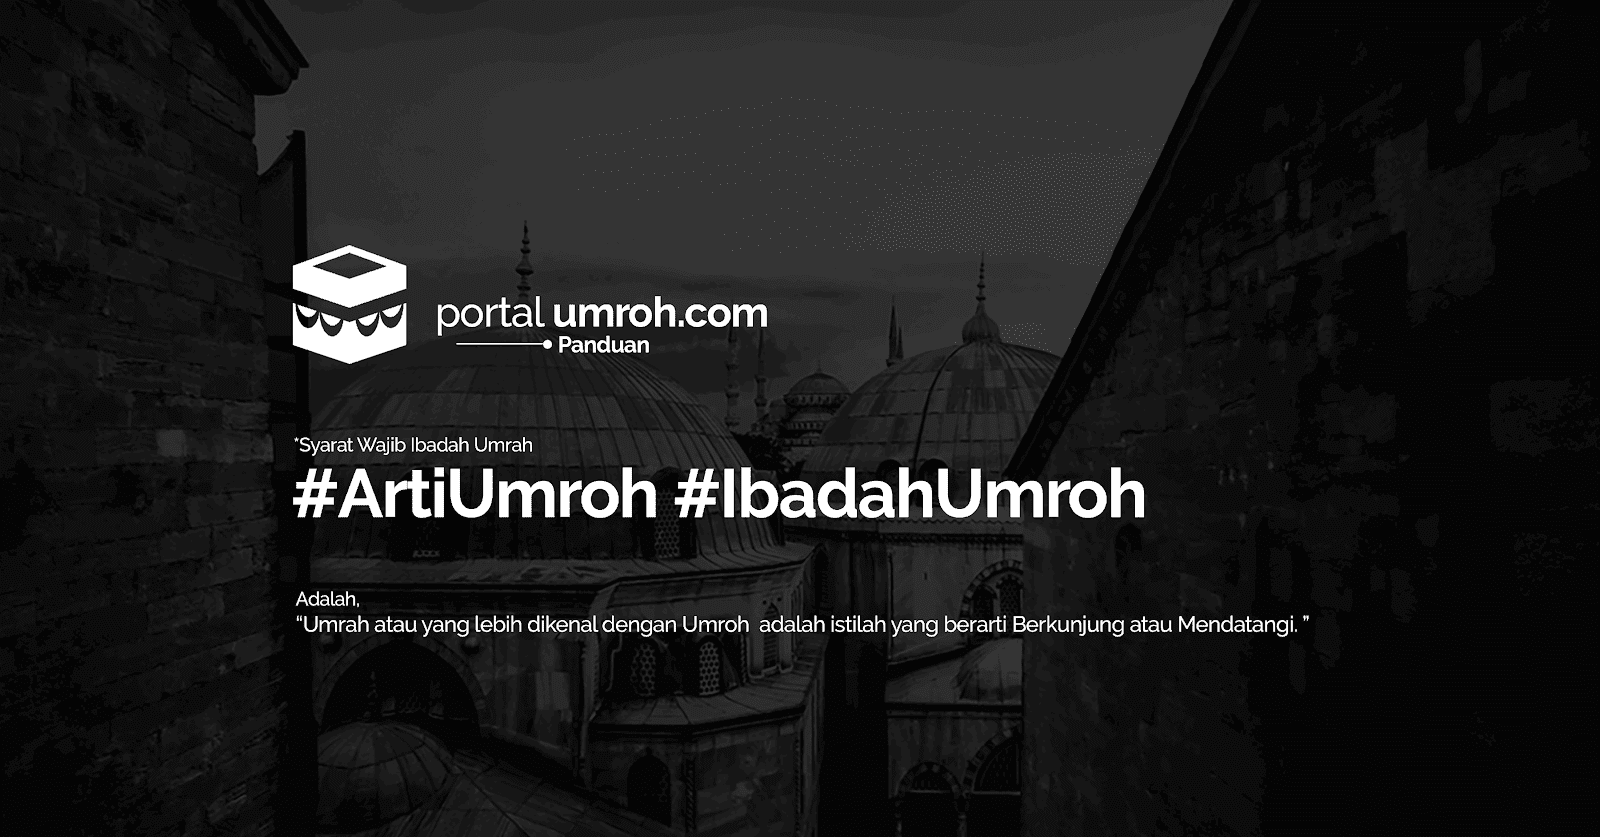 Portal Umroh - Arti, Hukum, Syarat, dan Rukun Wajib Umroh